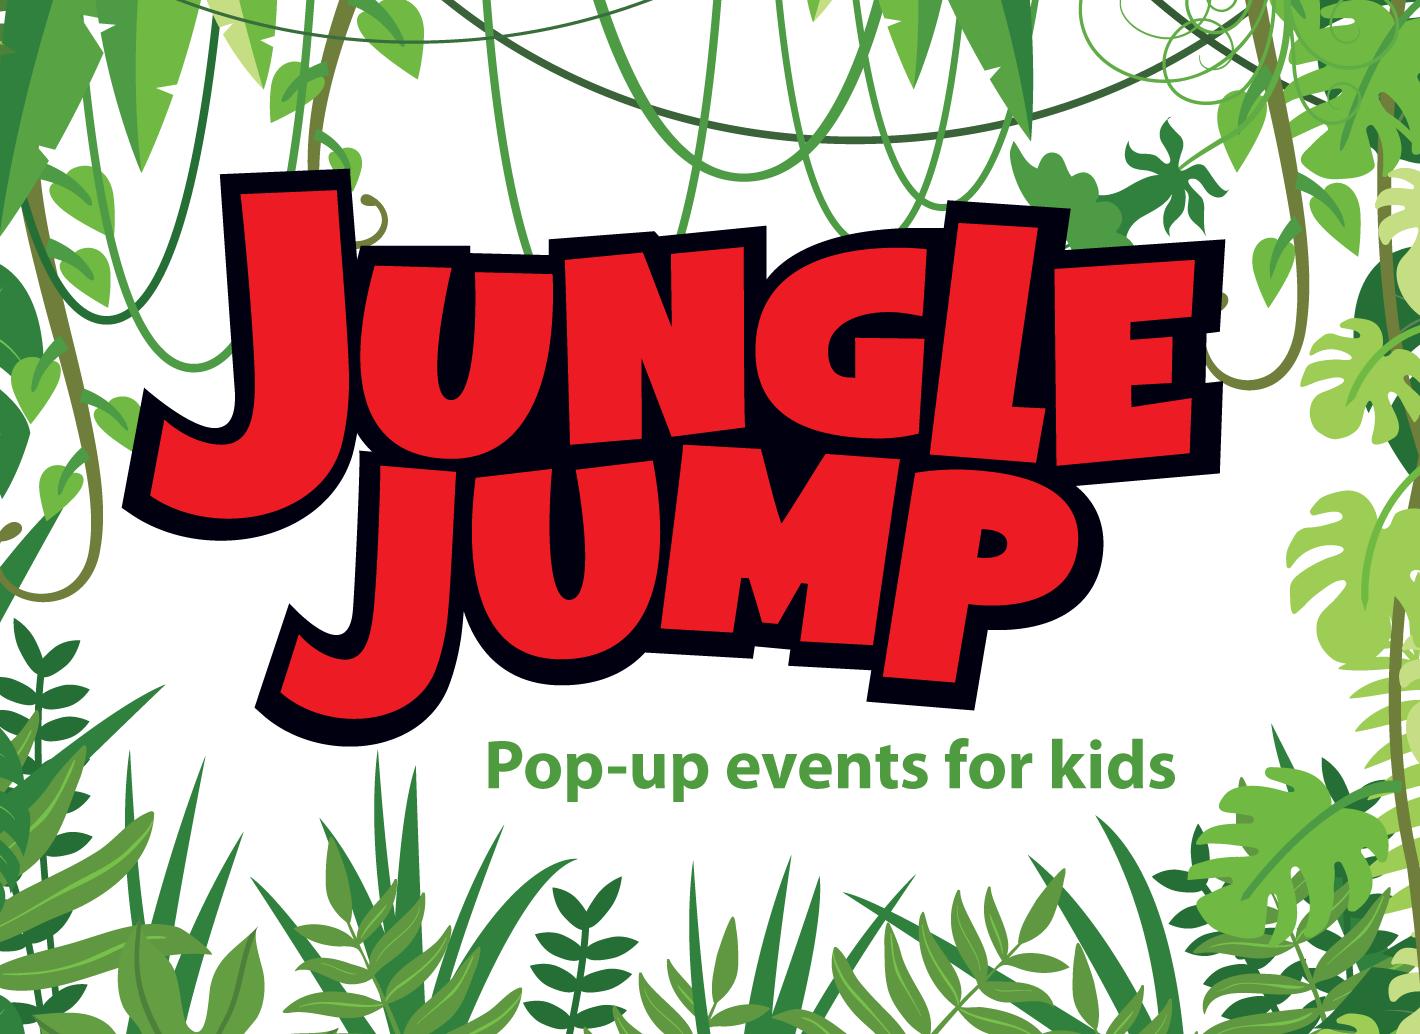 Jungle Jump pop-up events for kids logo